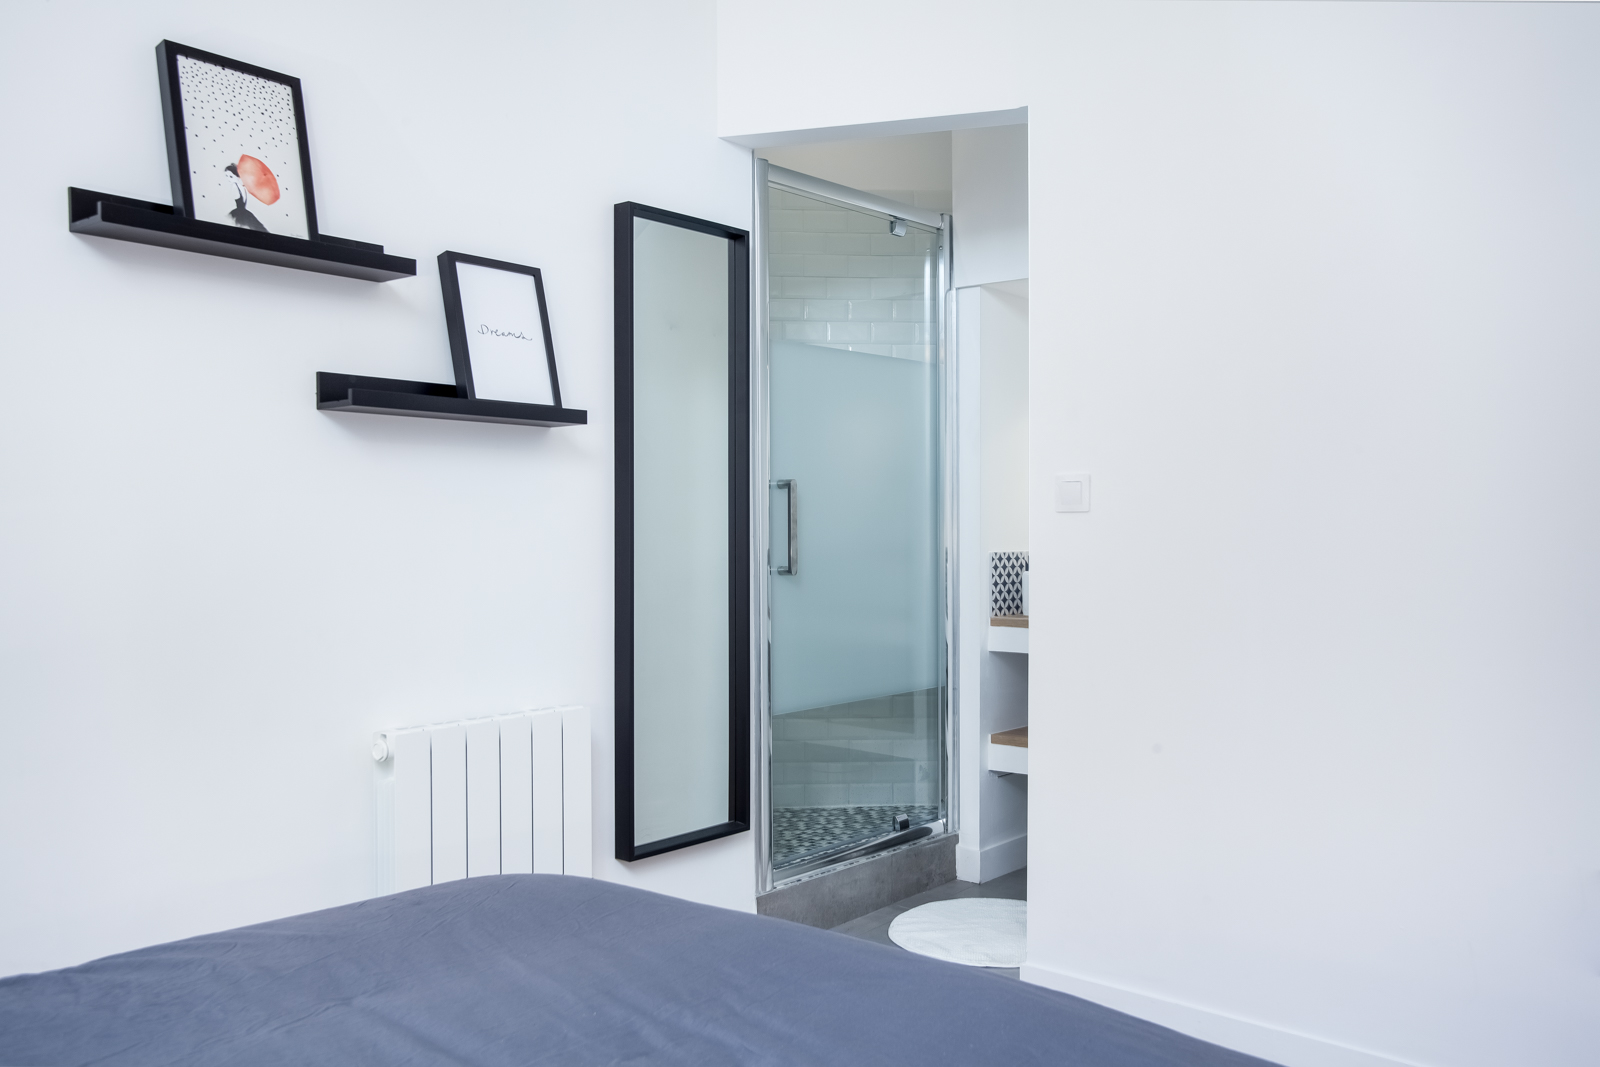 Novaclem - Chambre 2 Coloc Labadie - Investissement Marseille